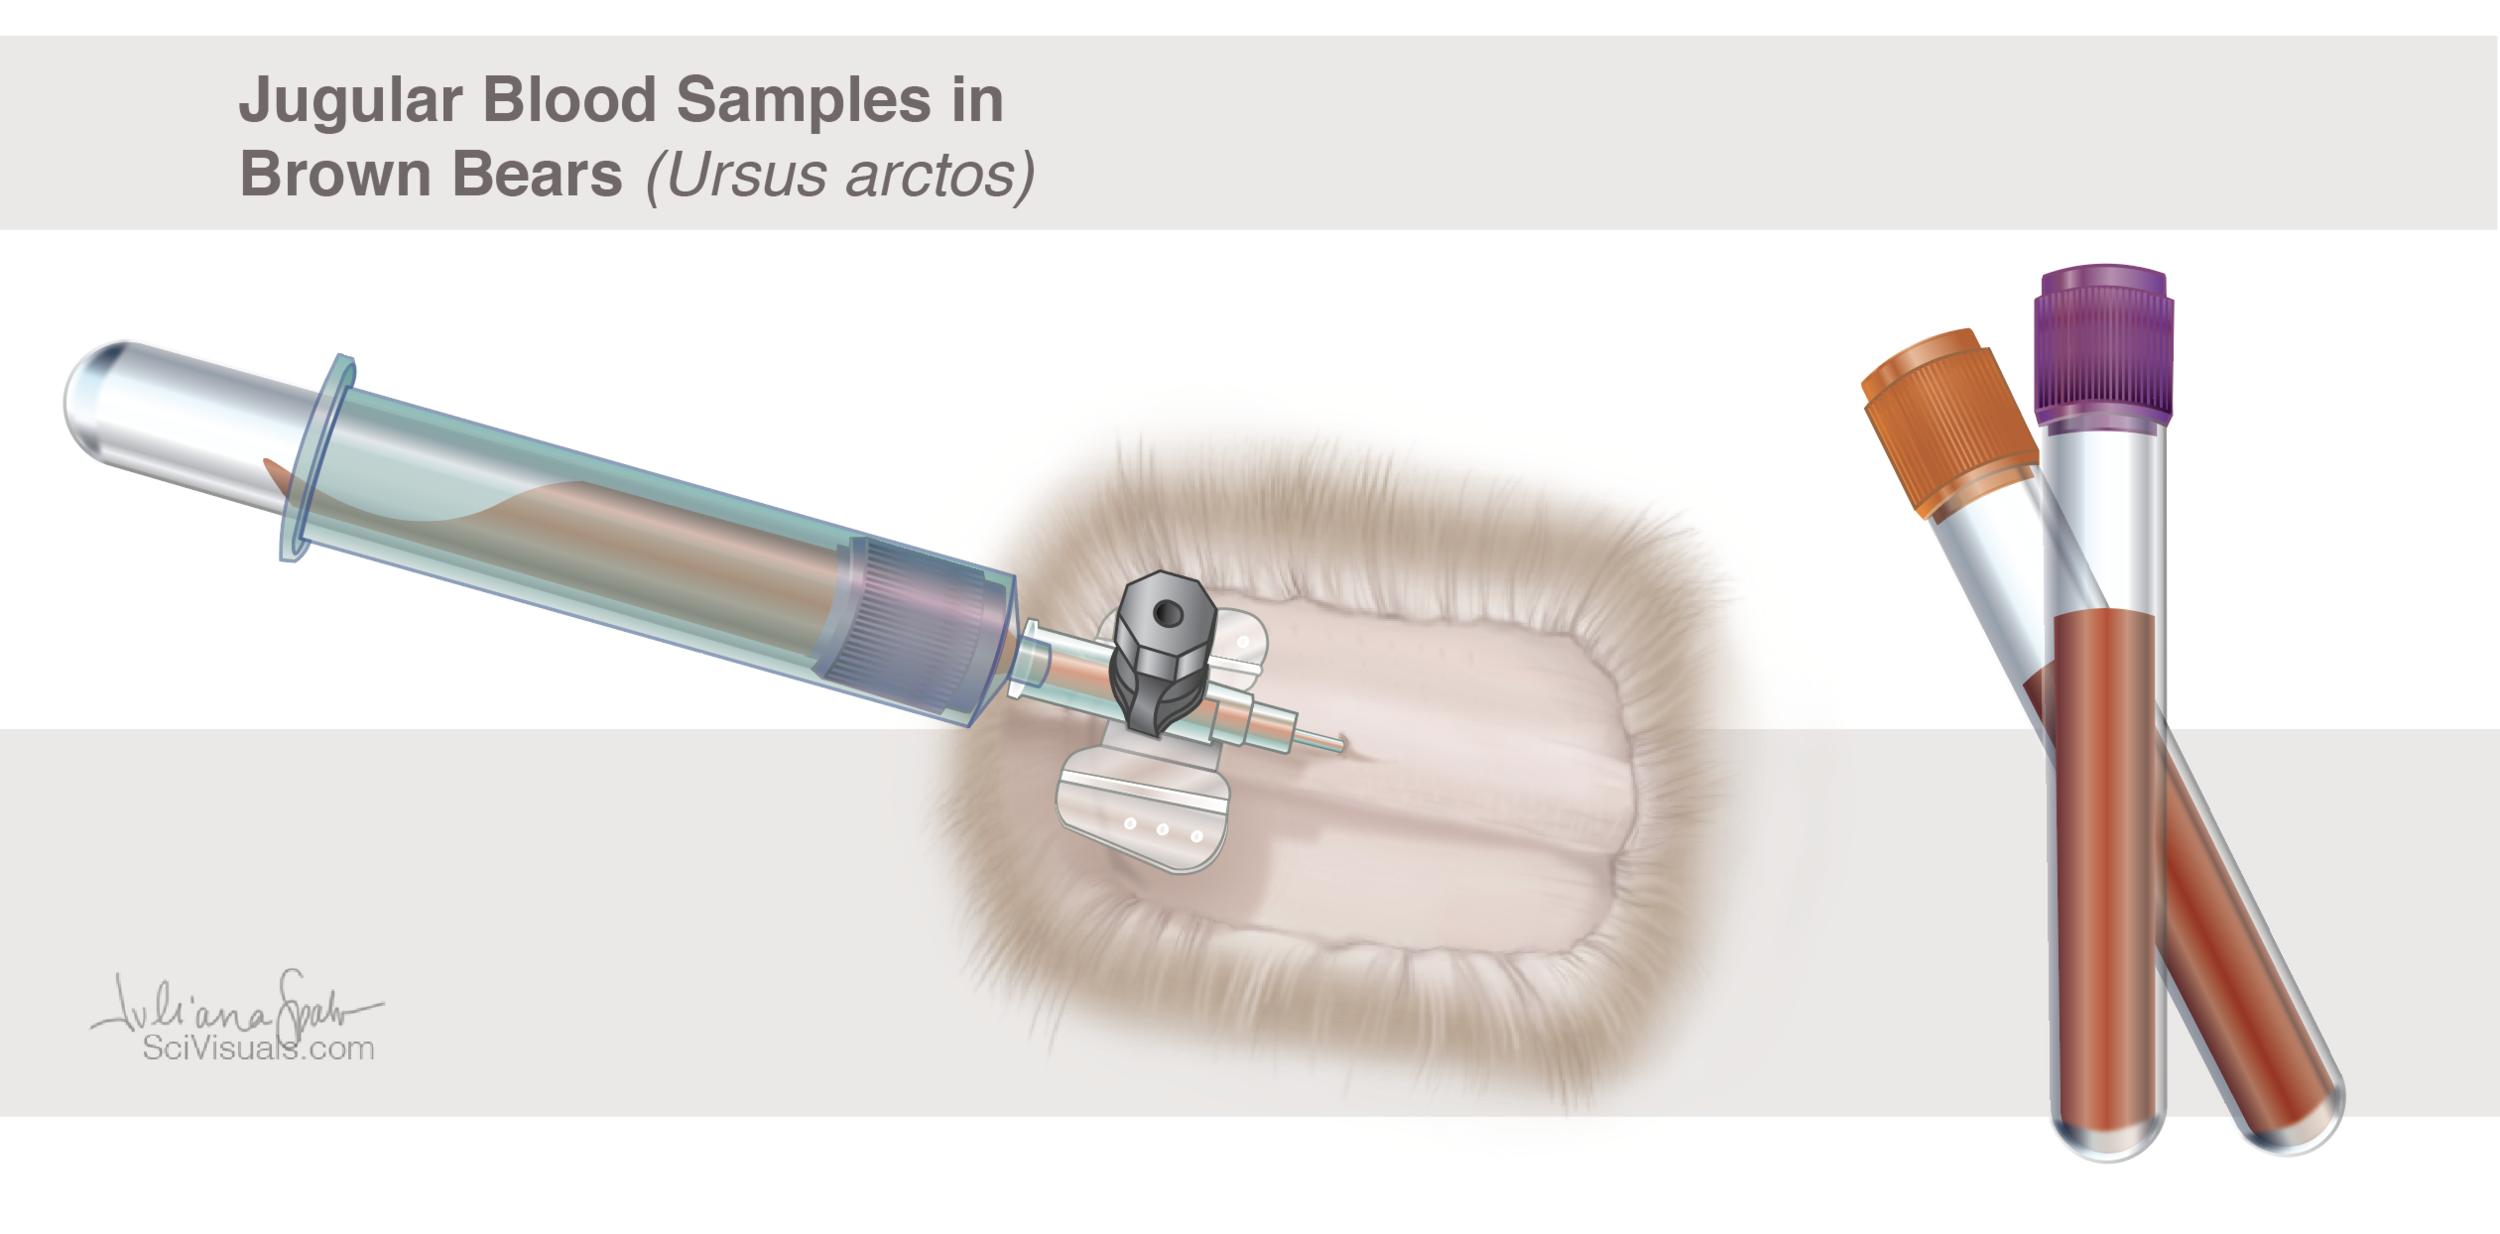 Jugular Blood Samples